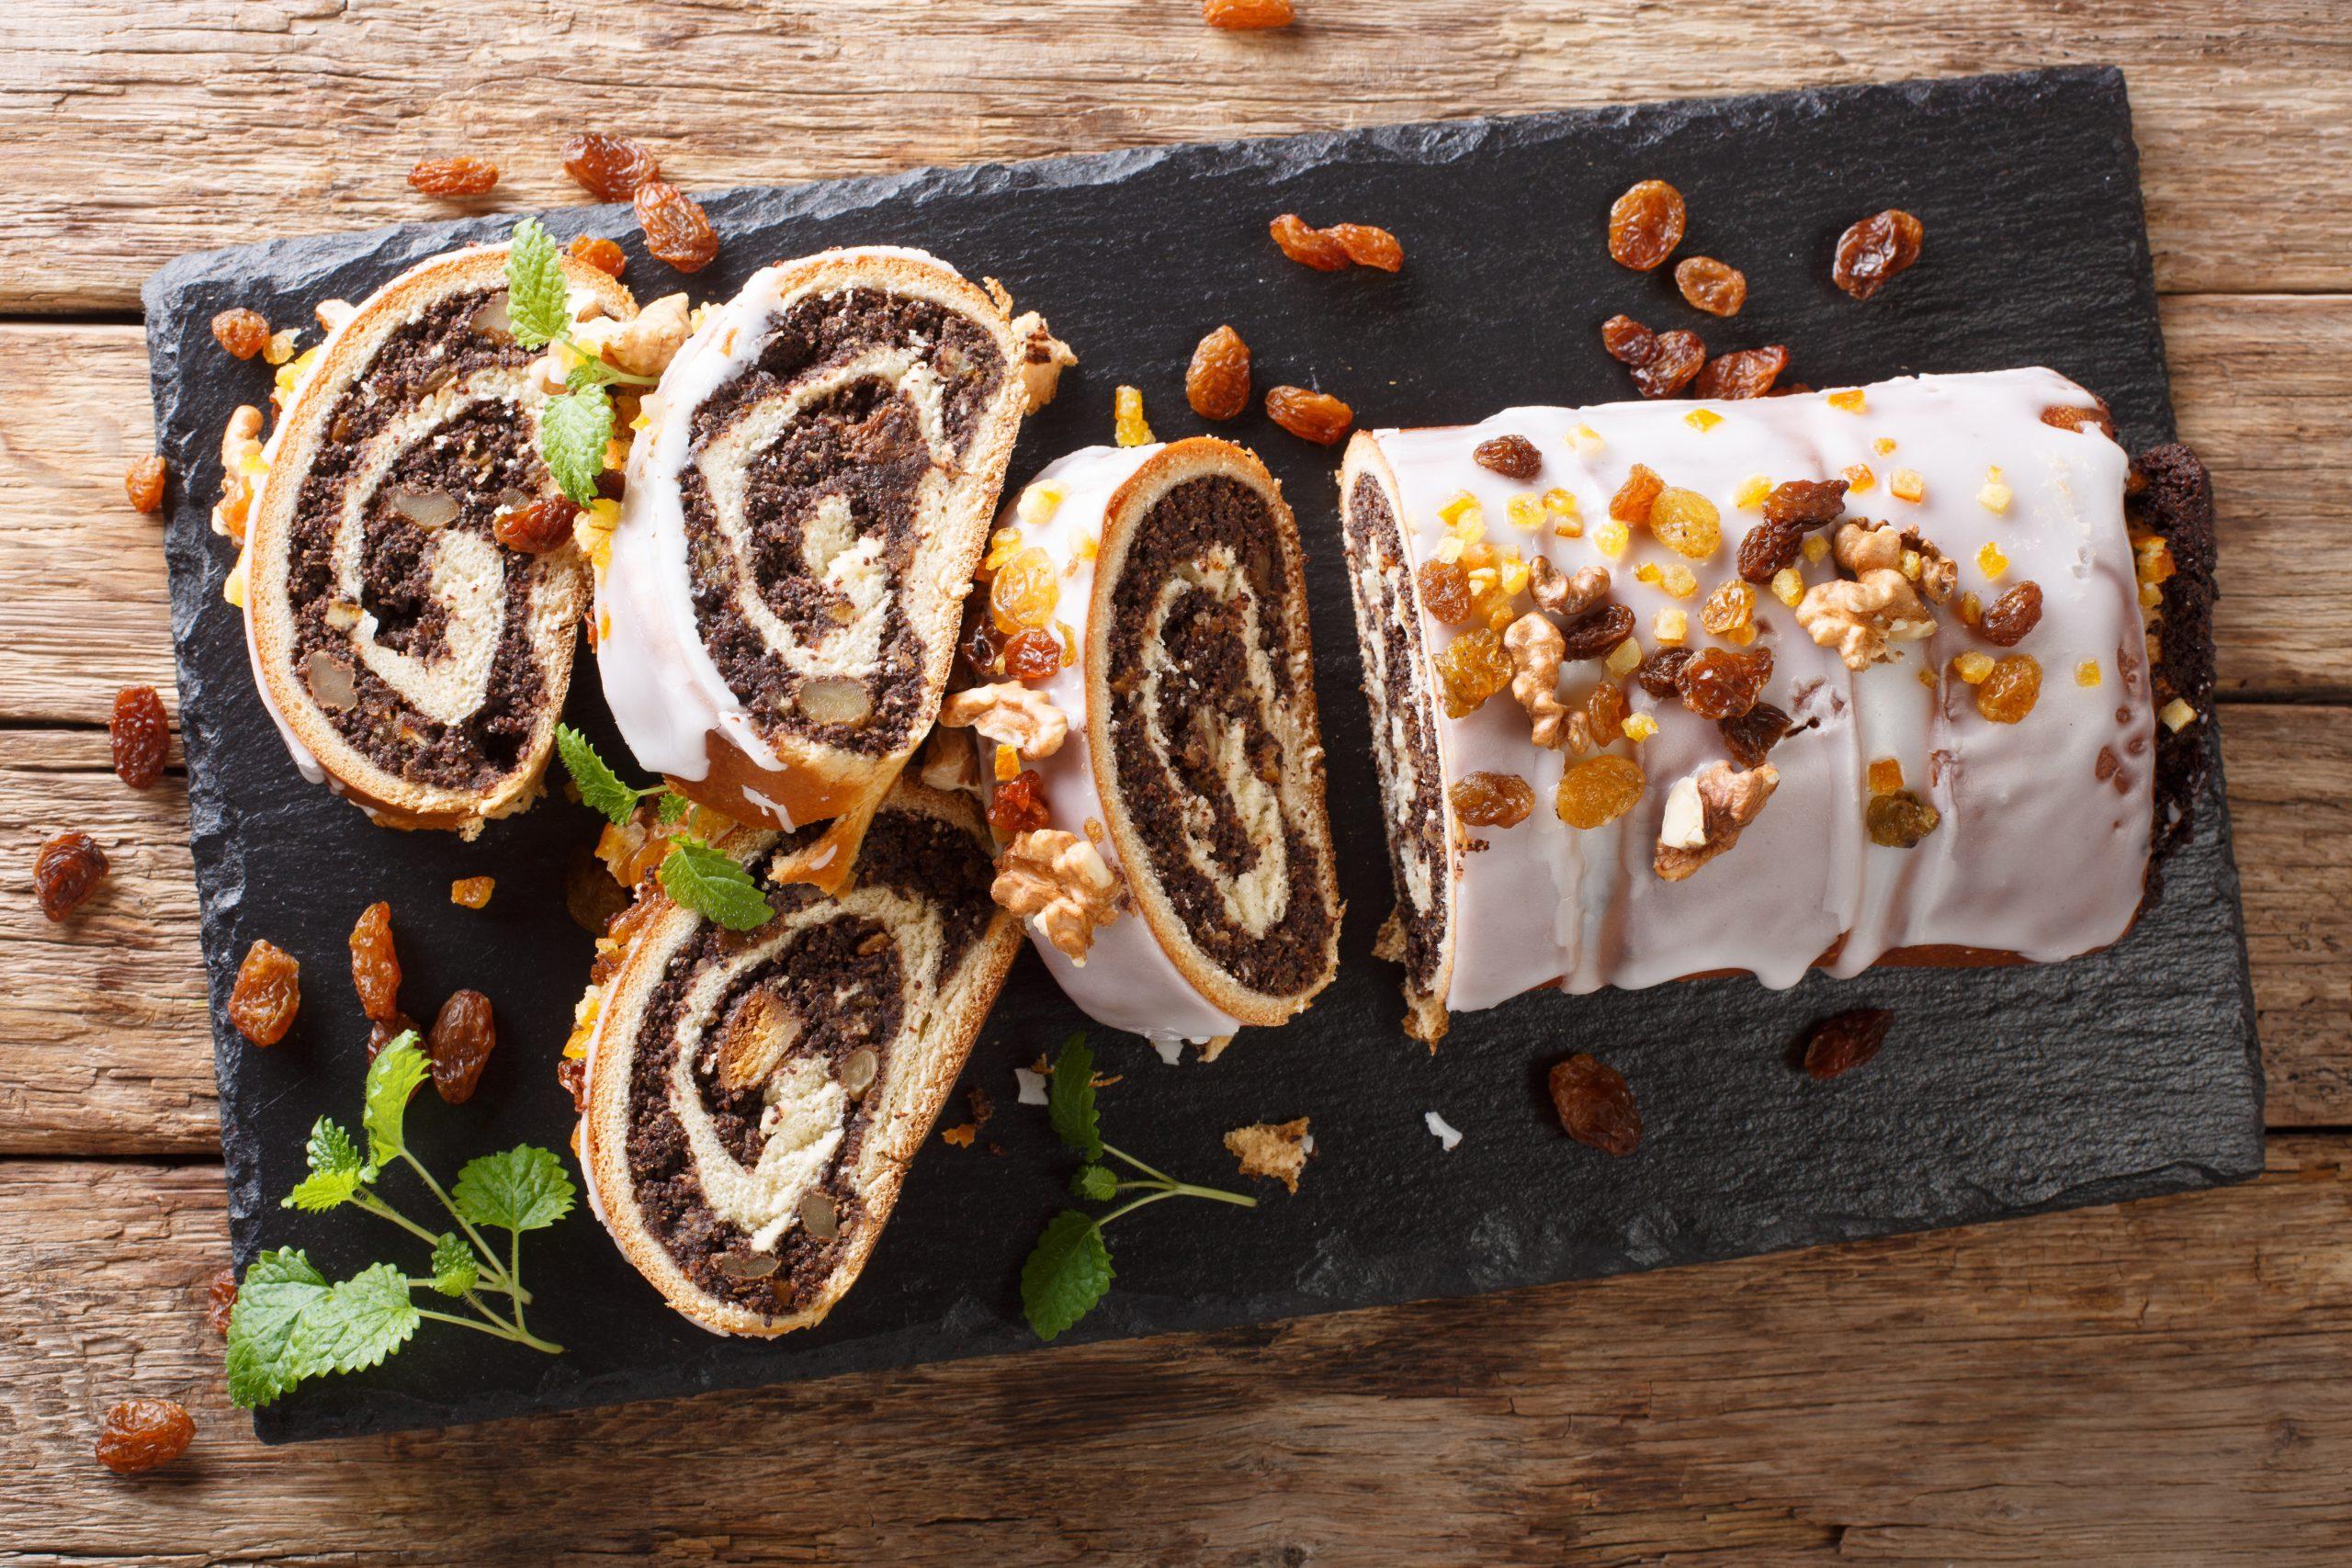 Festive glazed poppy beigli cake with raisins, walnuts close-up on a table. Horizontal top view